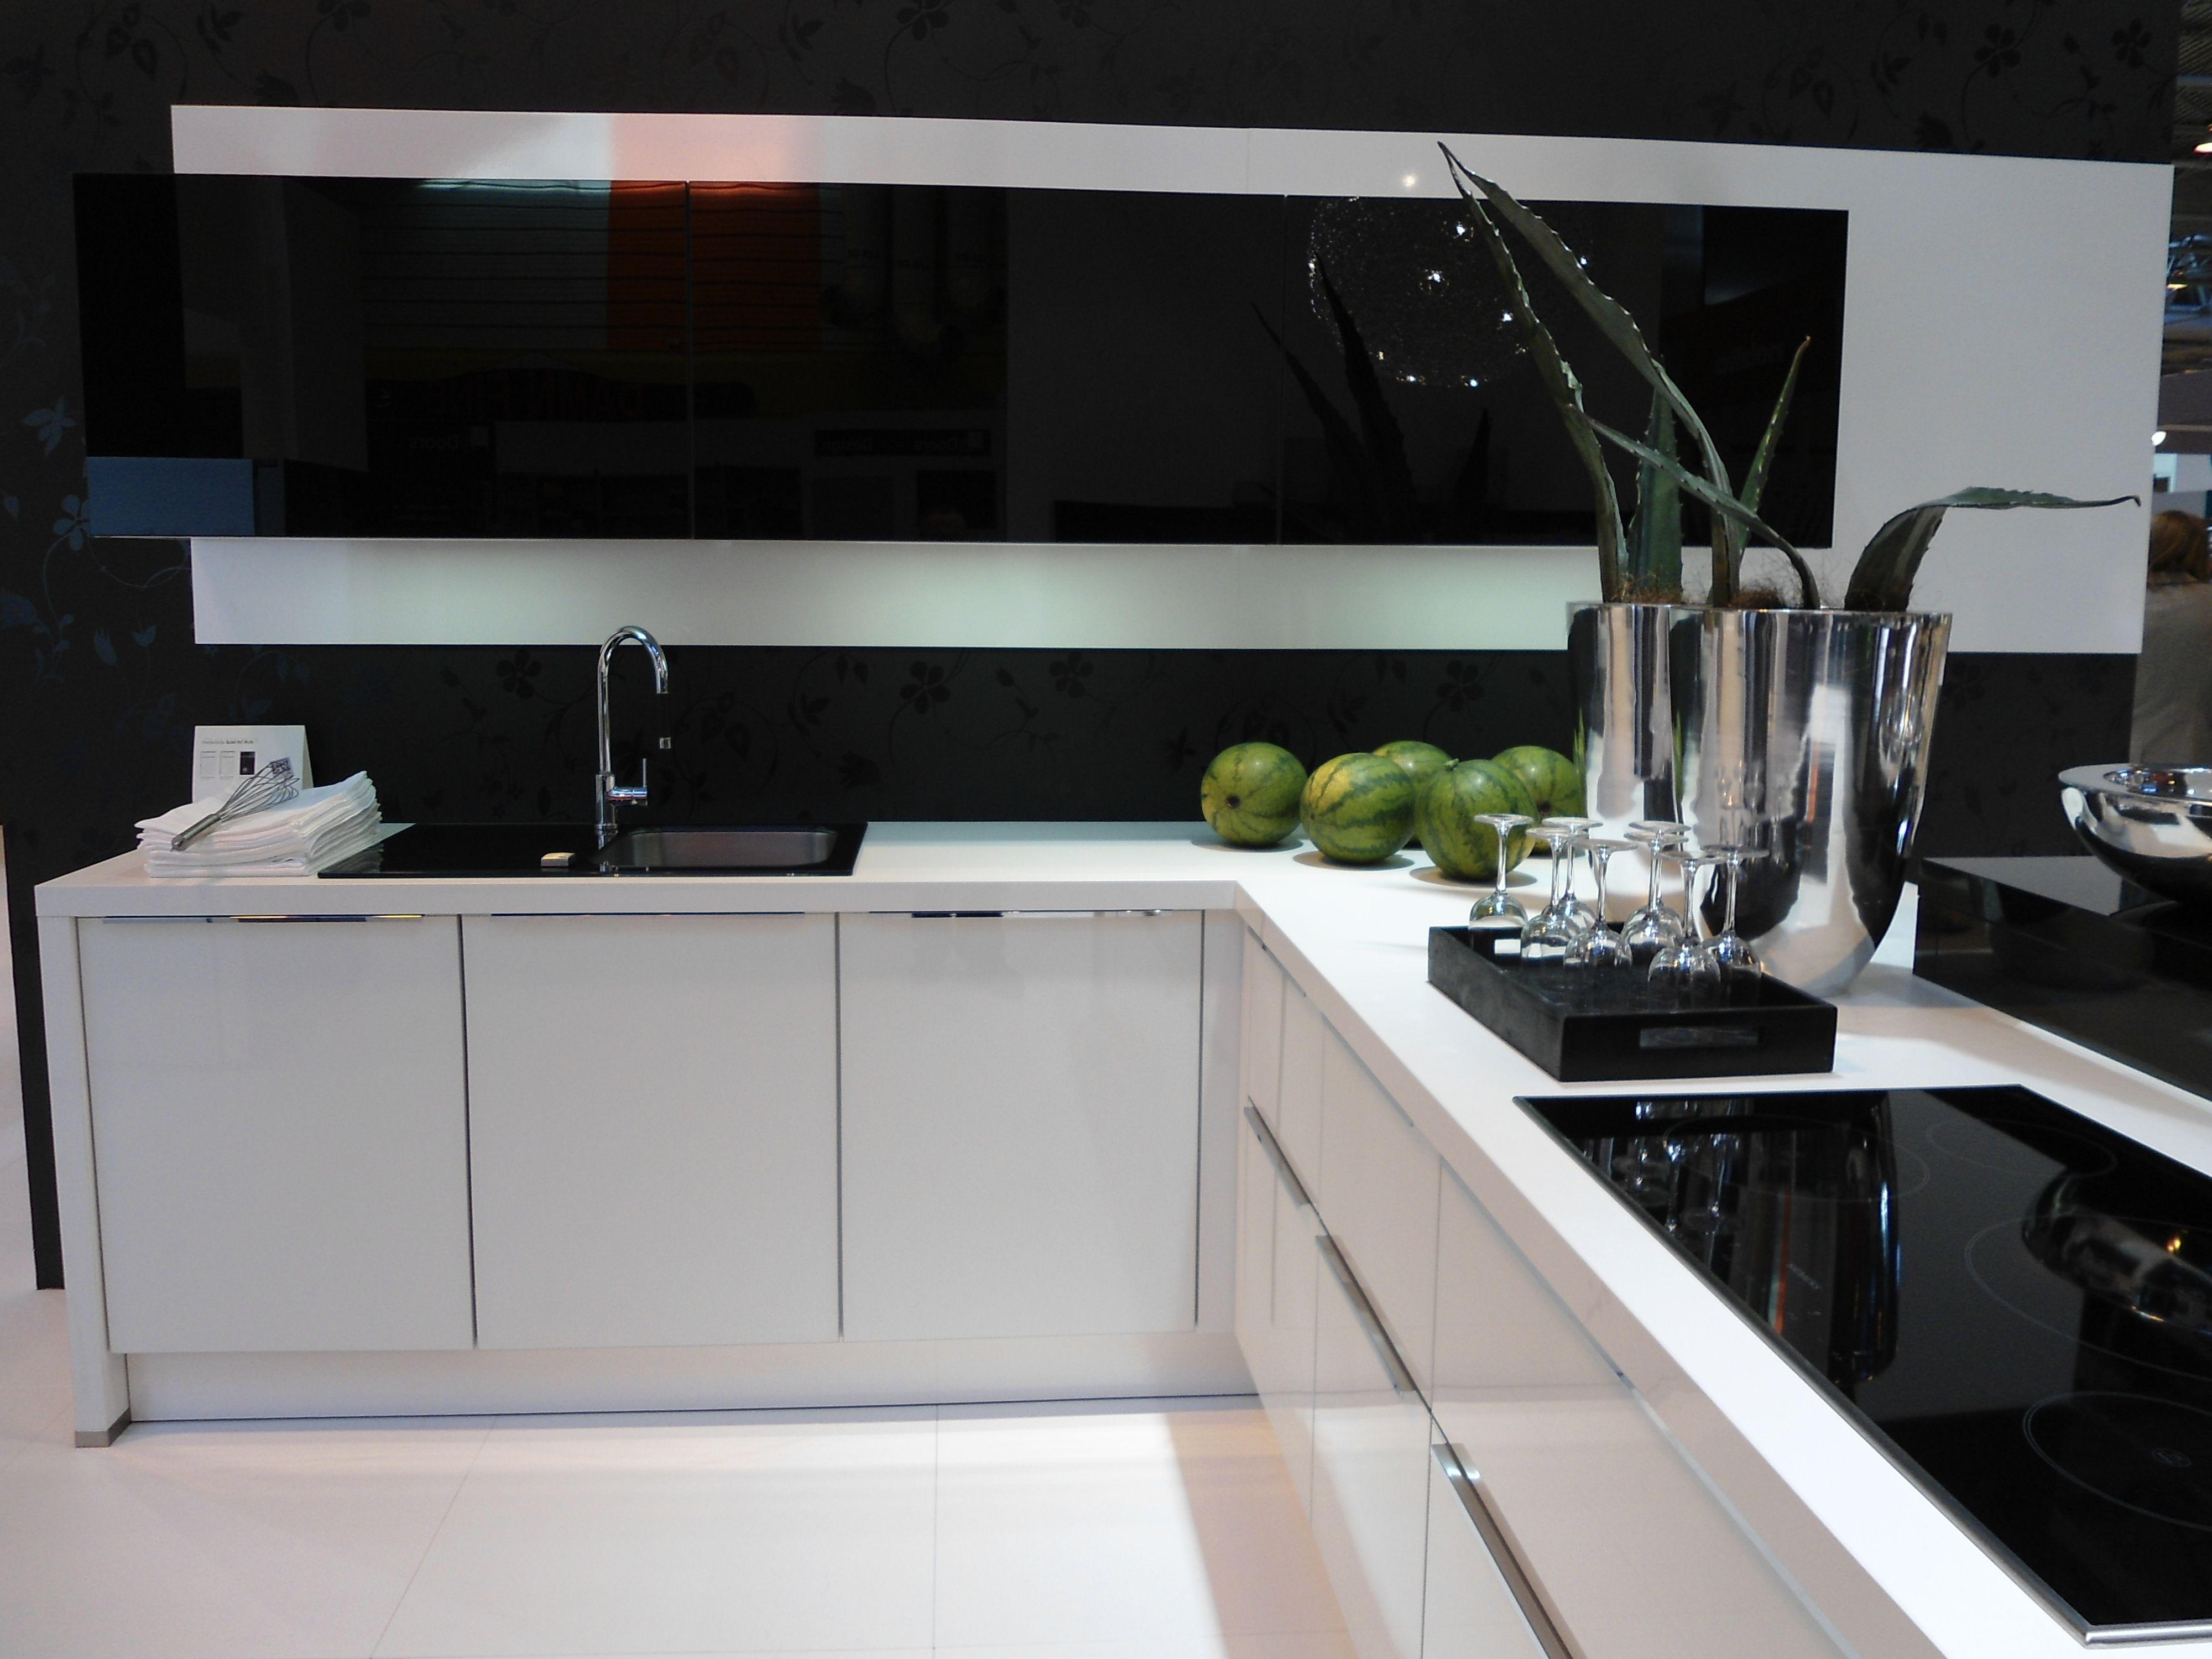 Designer fitted Kitchens in Ayr visit www